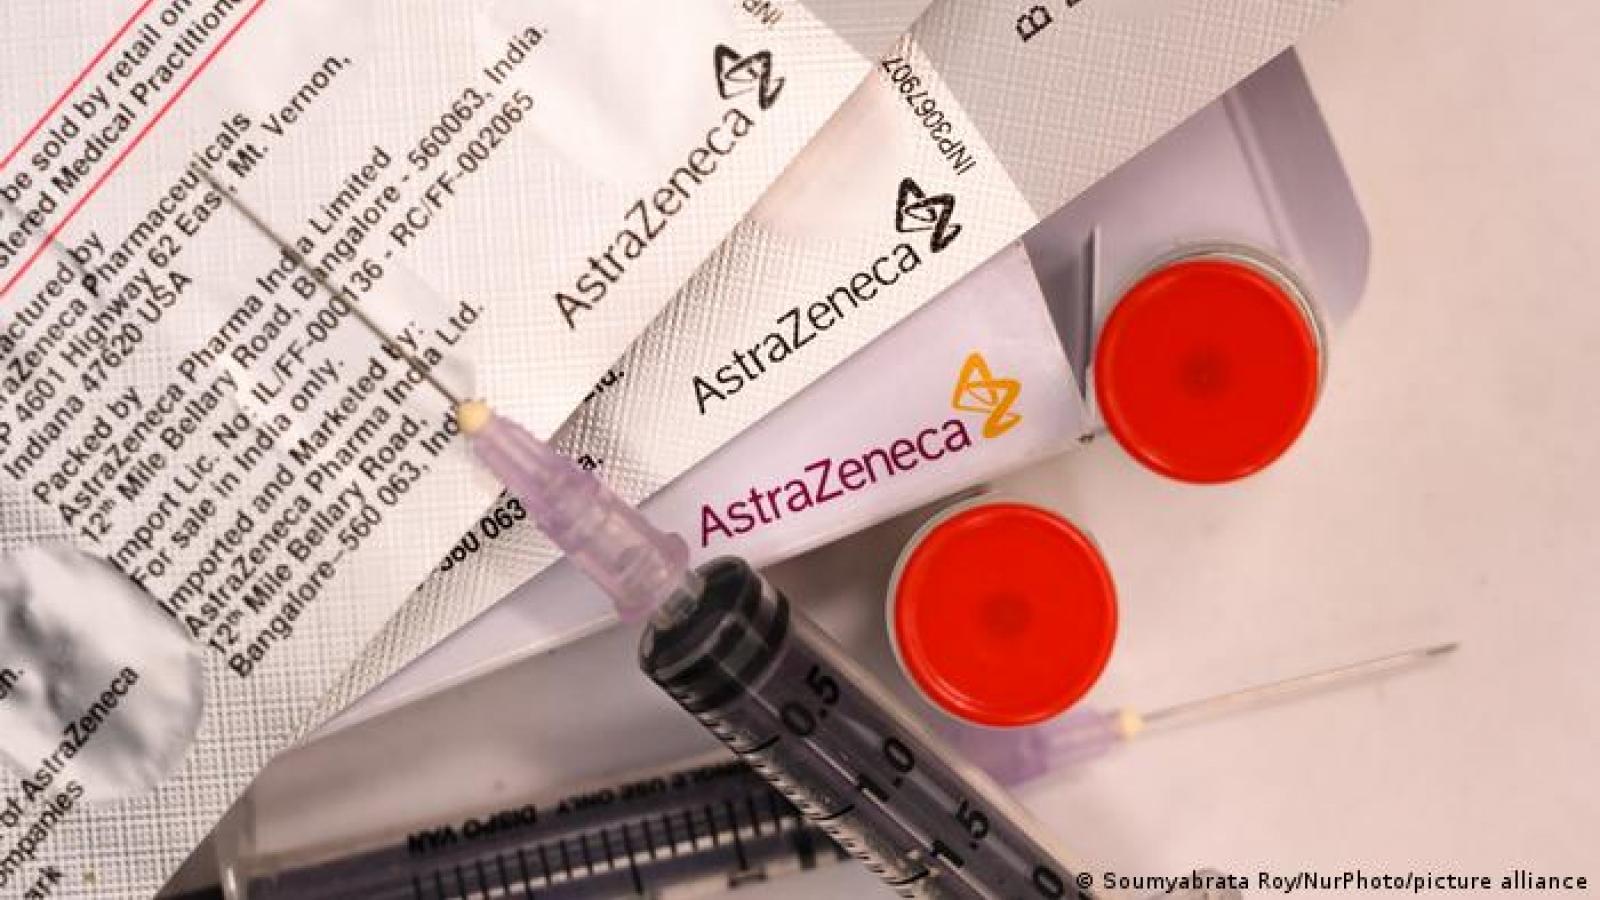 EU yêu cầu AstraZeneca giao 120 triệu liều vaccine Covid-19 vào cuối tháng 6